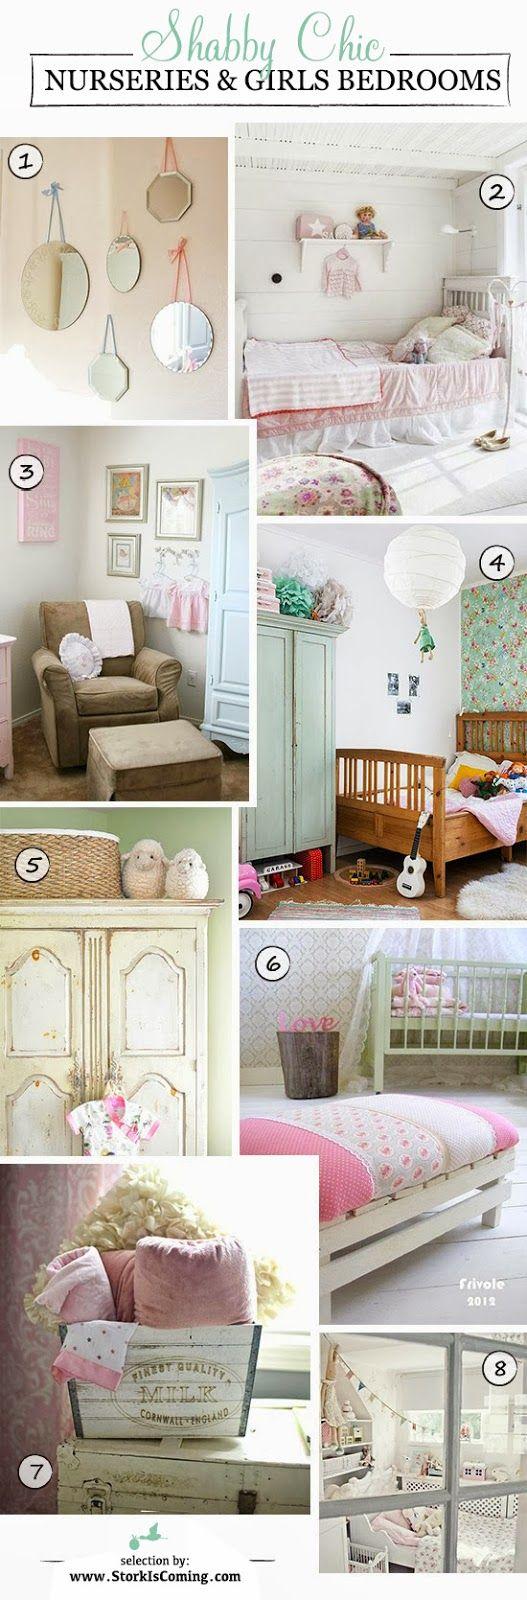 best shabby chic bedrooms for little girls http://www.storkiscoming.com